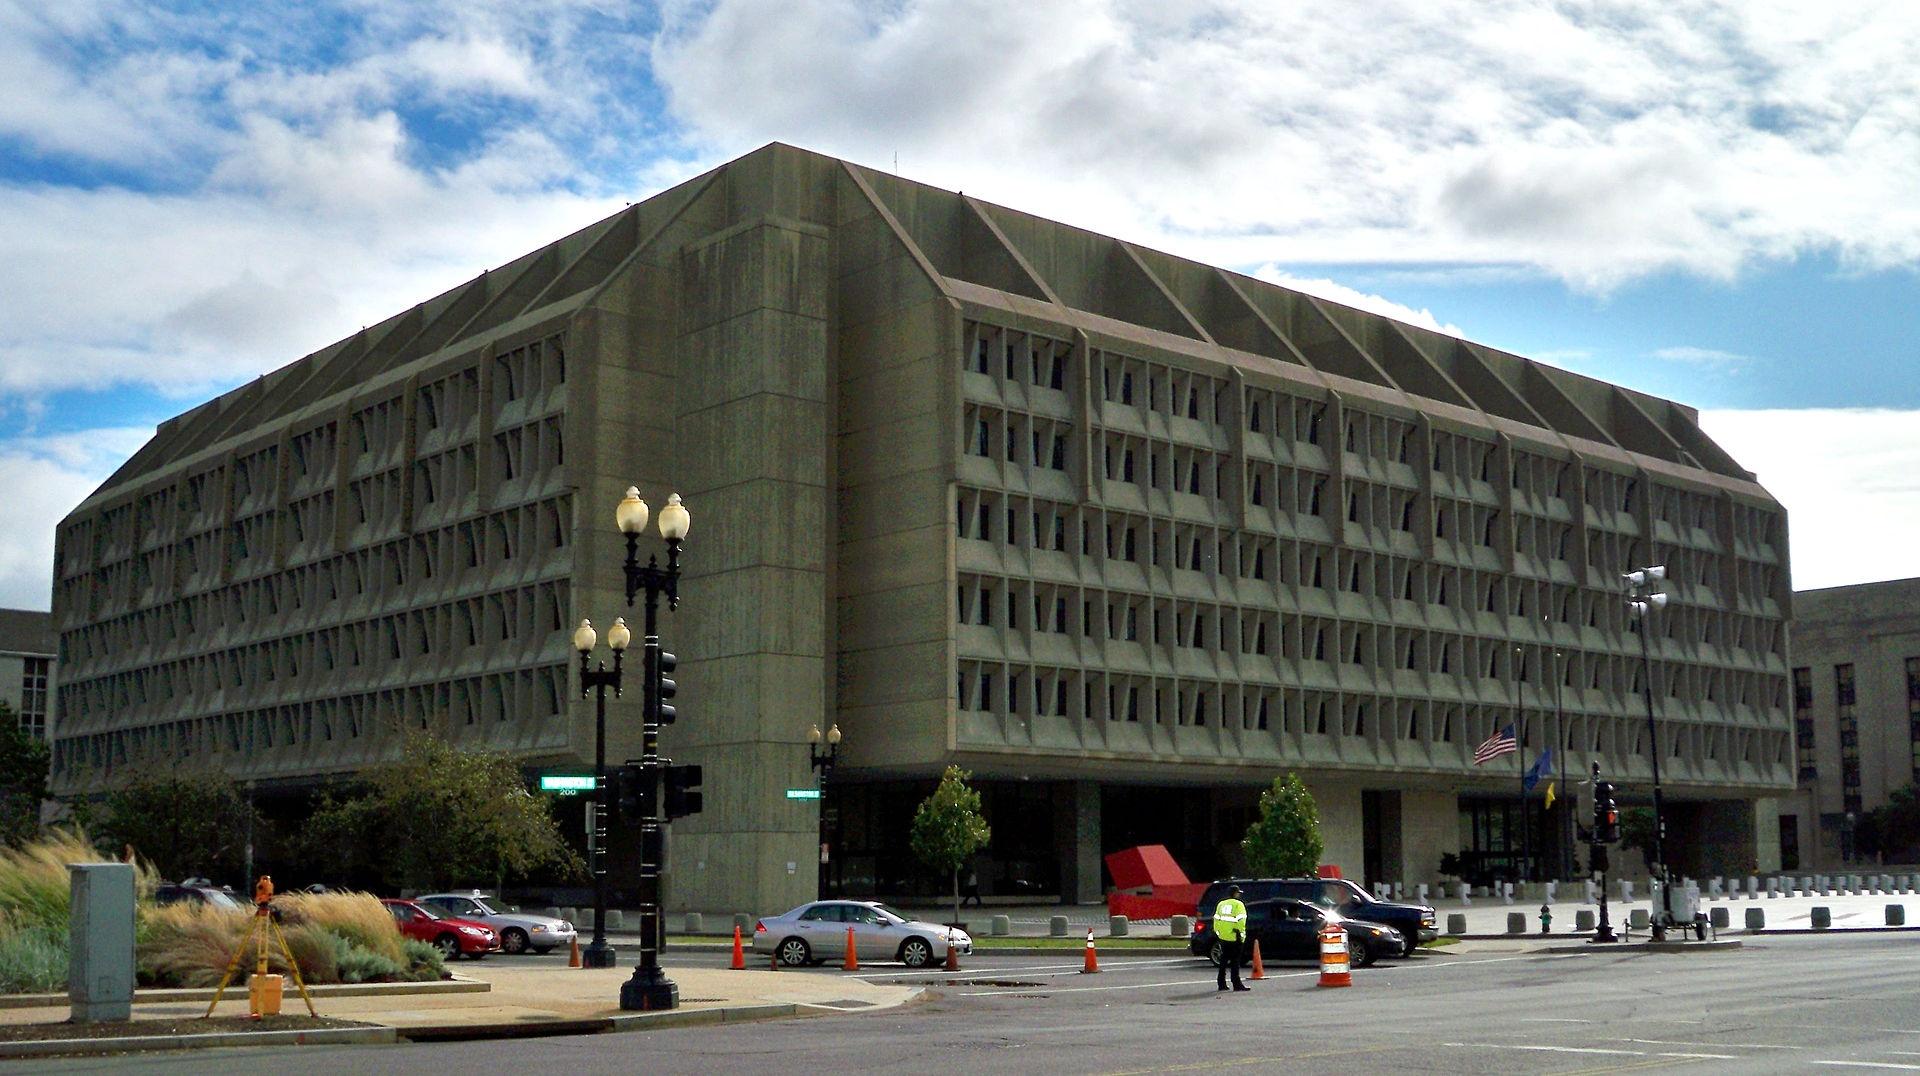 Брутализм в архитектуре подчеркивает грубую фактуру бетона